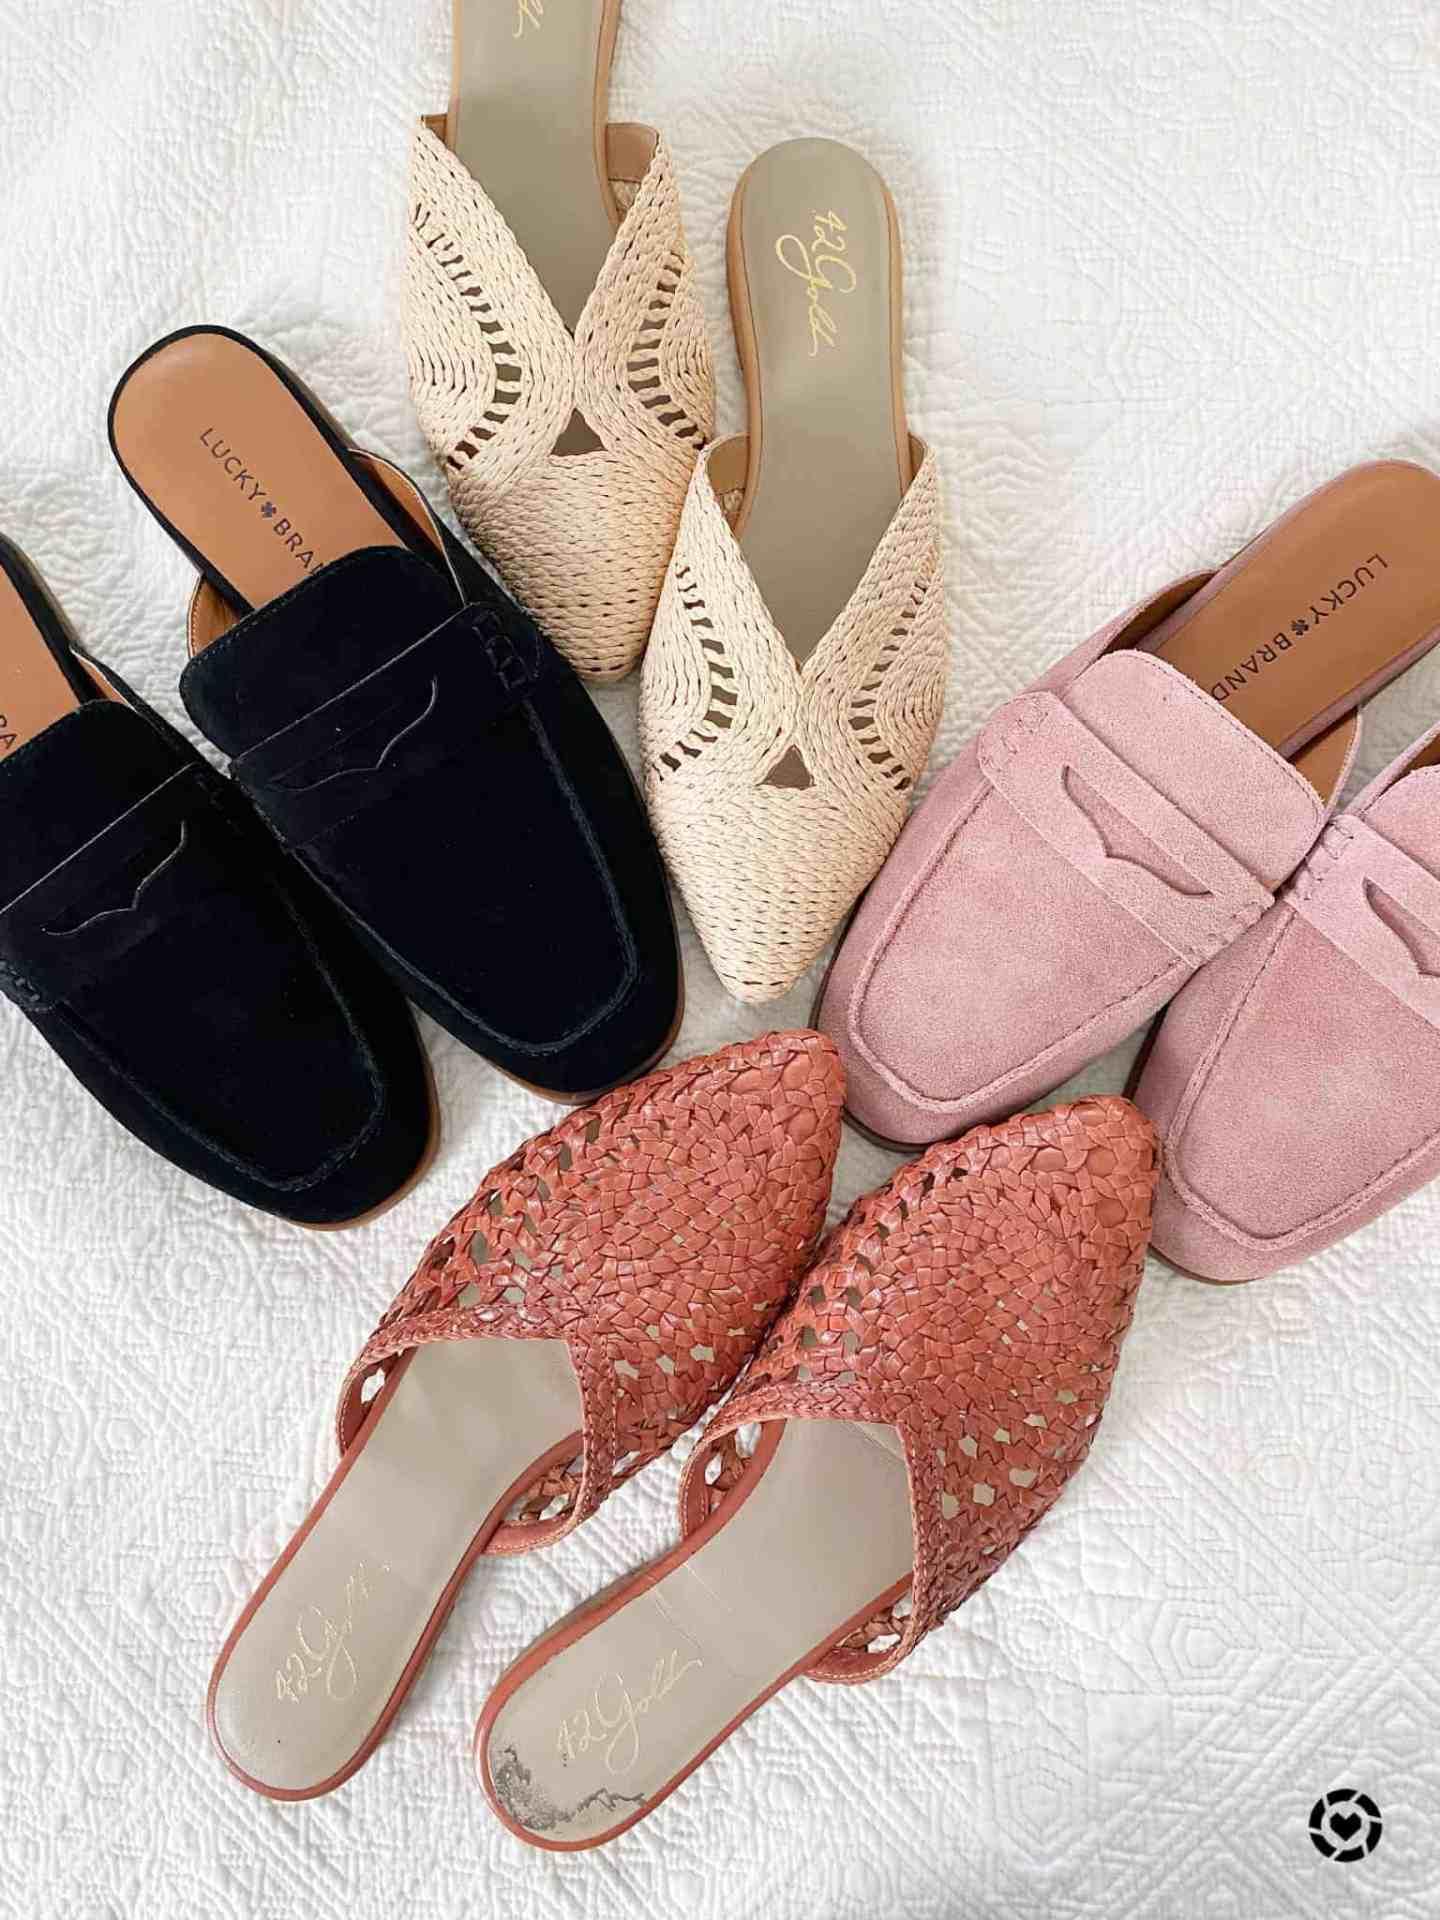 mule shoes for women 2021